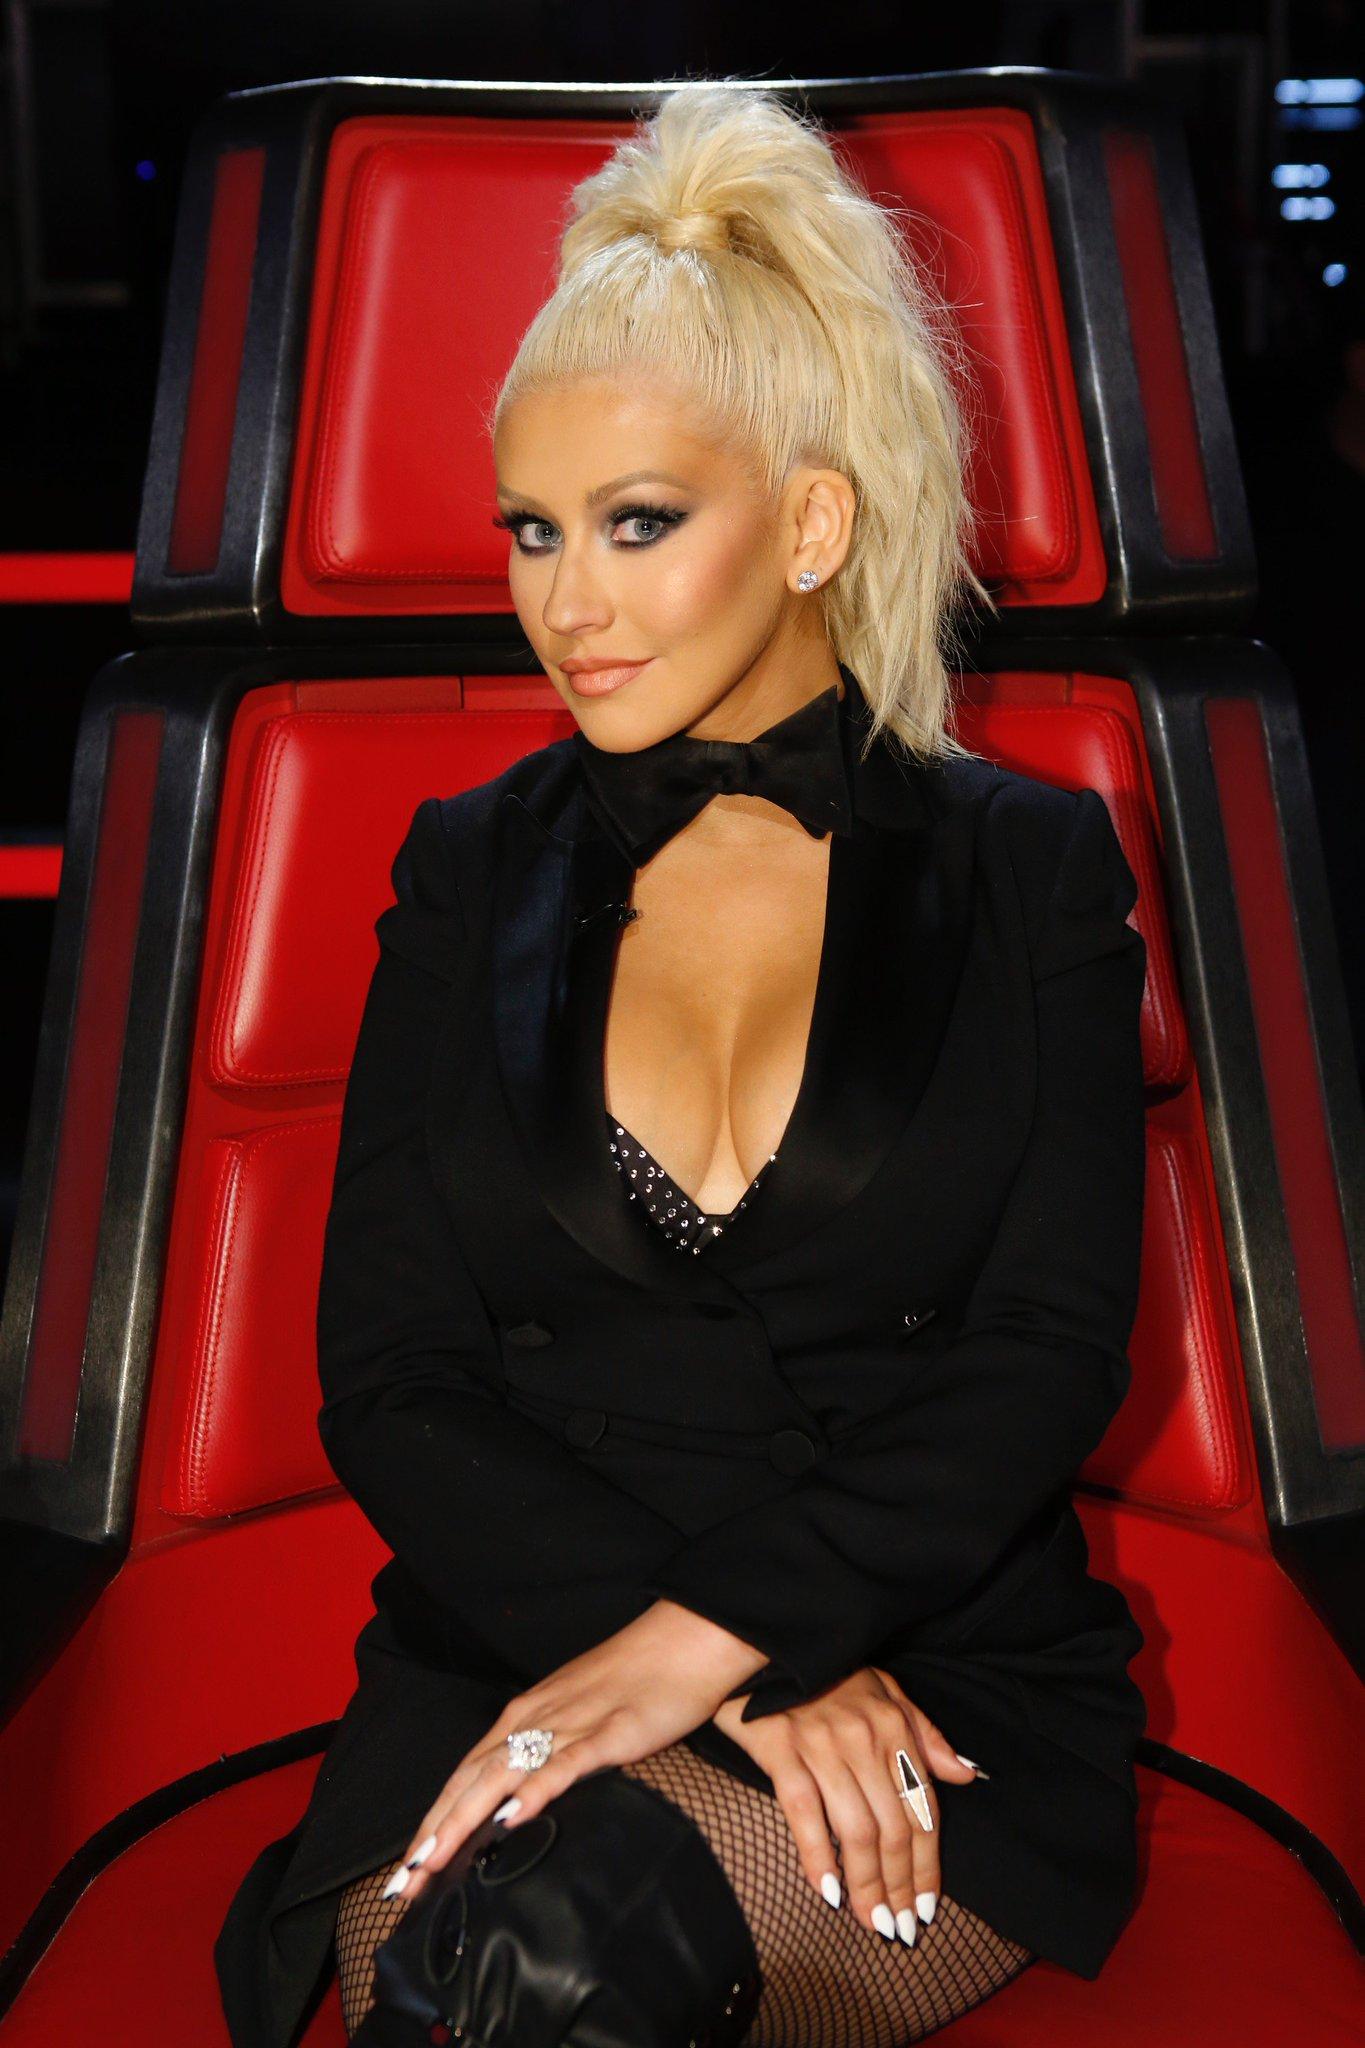 "Christina Aguilera on Twitter: ""Get the look - # ... Christina Aguilera"